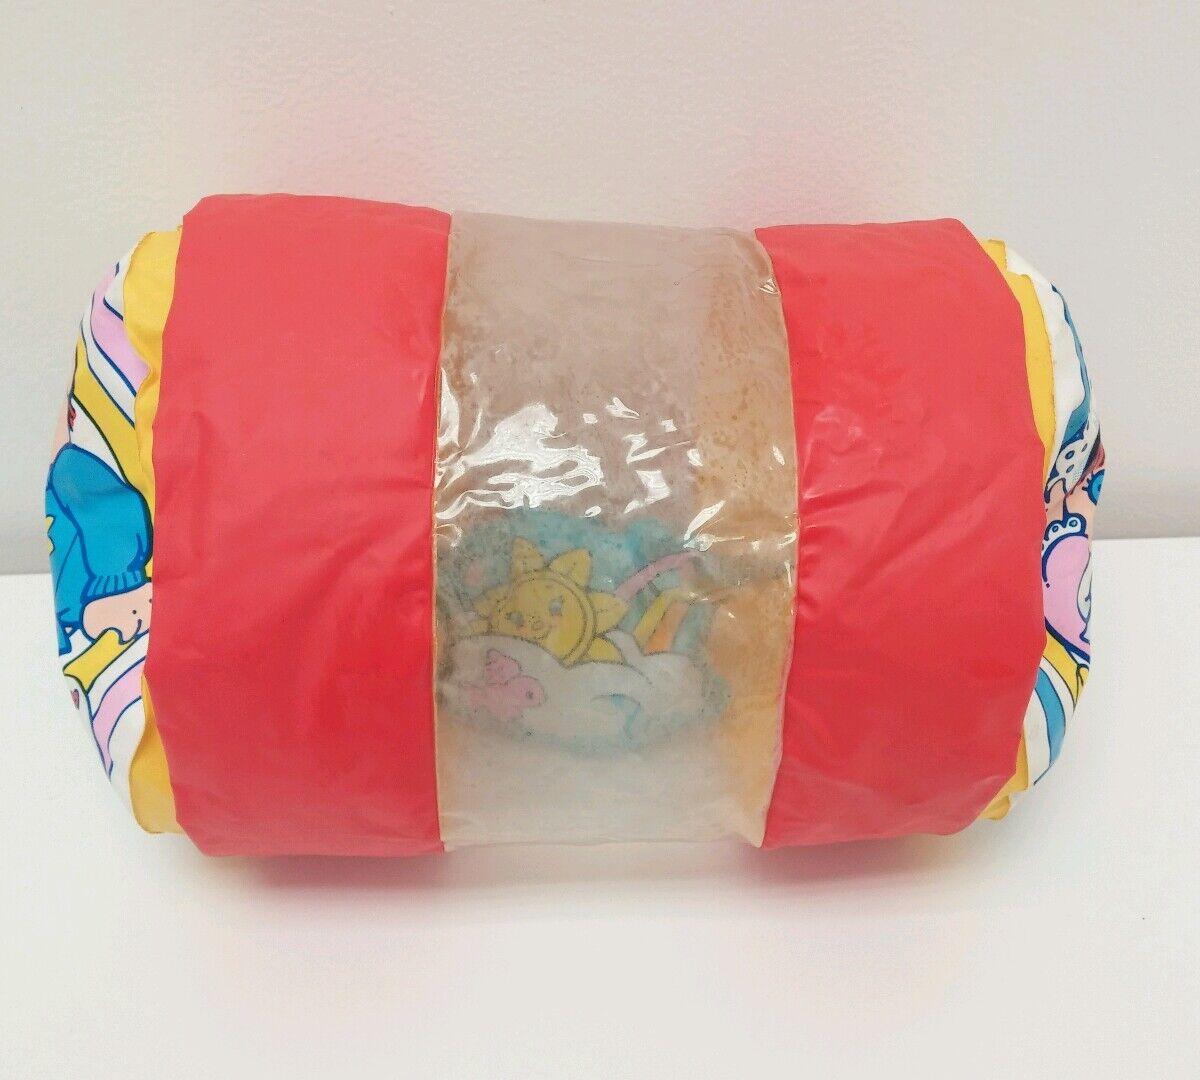 Vintage 1988 Shelcore Inflatable Vinyl Shelykins Baby Barrel Peek in Roll Toy